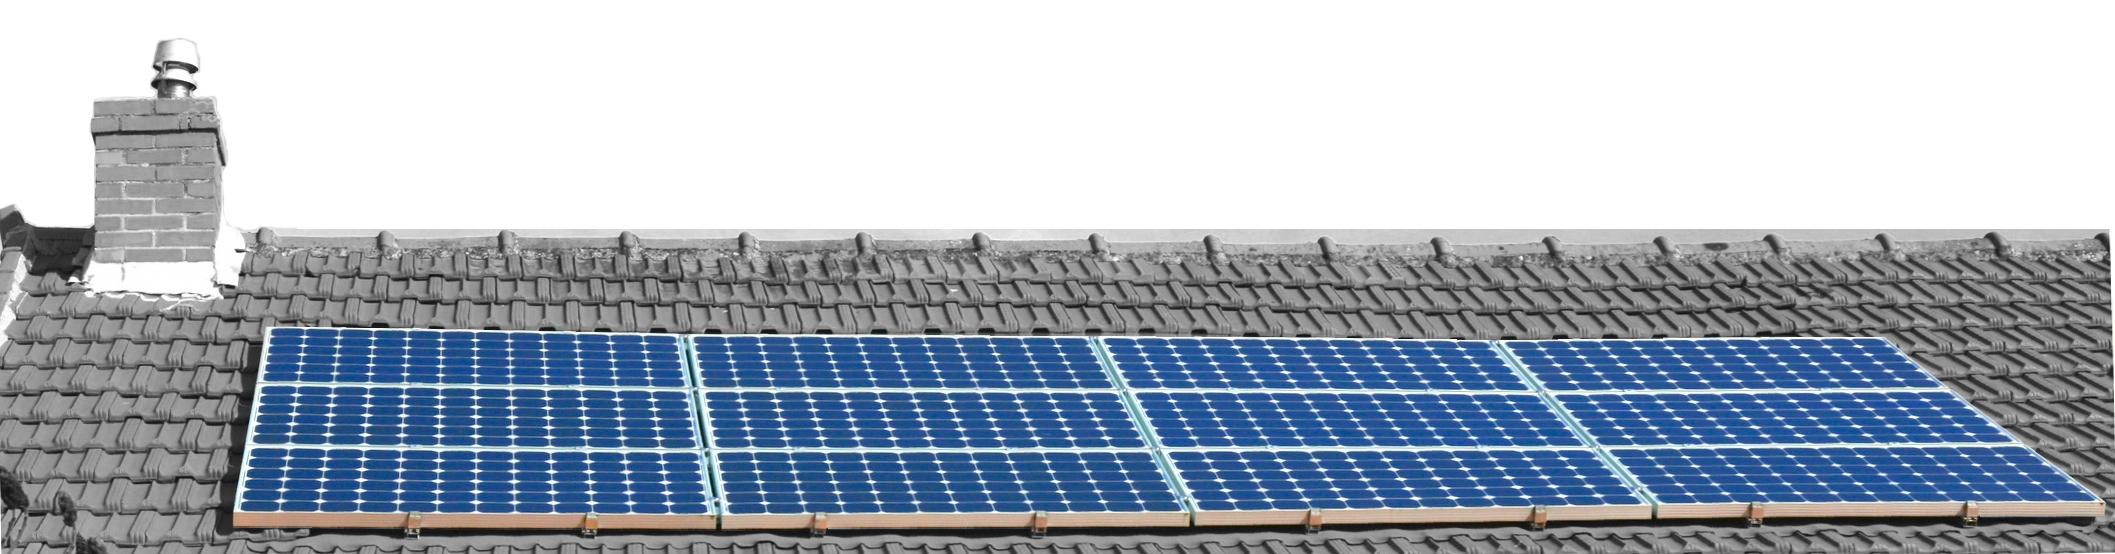 Is-solar-eletricity-worth-it-2115